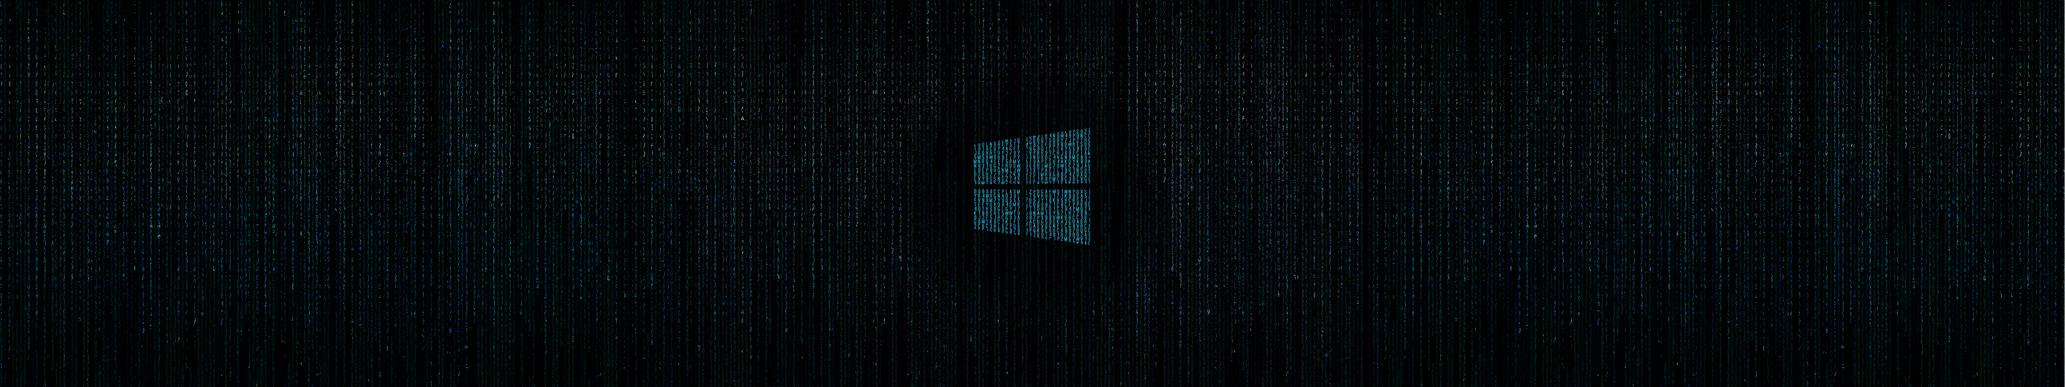 Images of Windows Matrix Screensaver - #rock-cafe